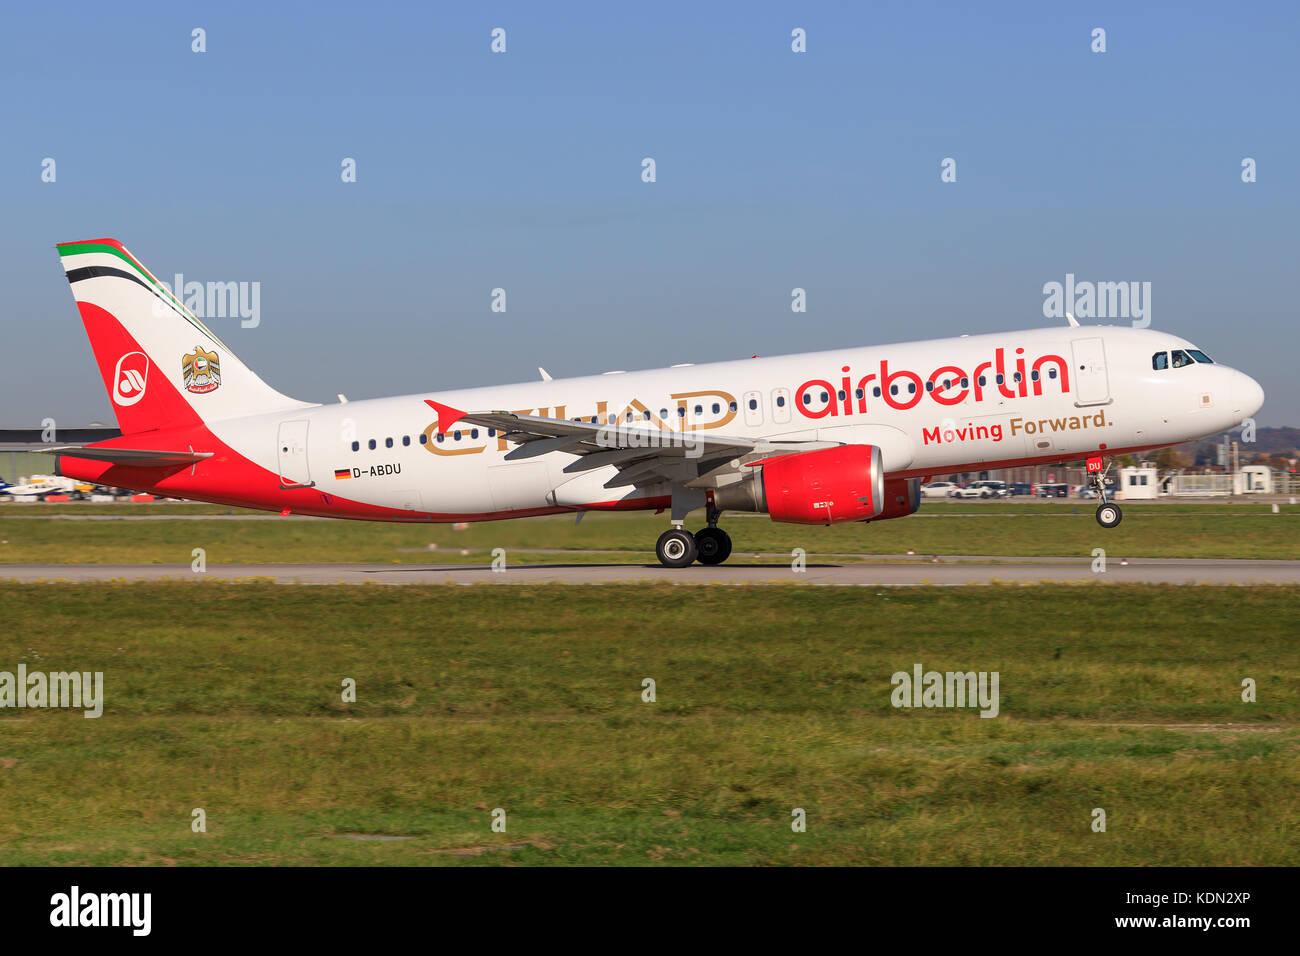 Stuttgart/Germany September 29, 2017: Air Berlin A320 at Stuttgart Airport. - Stock Image